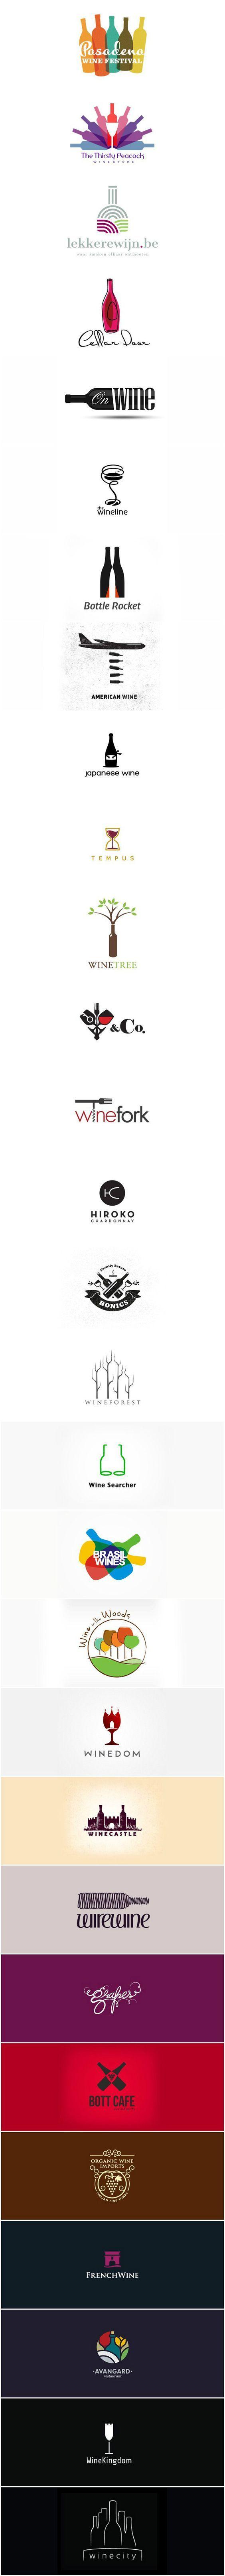 logos of wine #logo #wine: